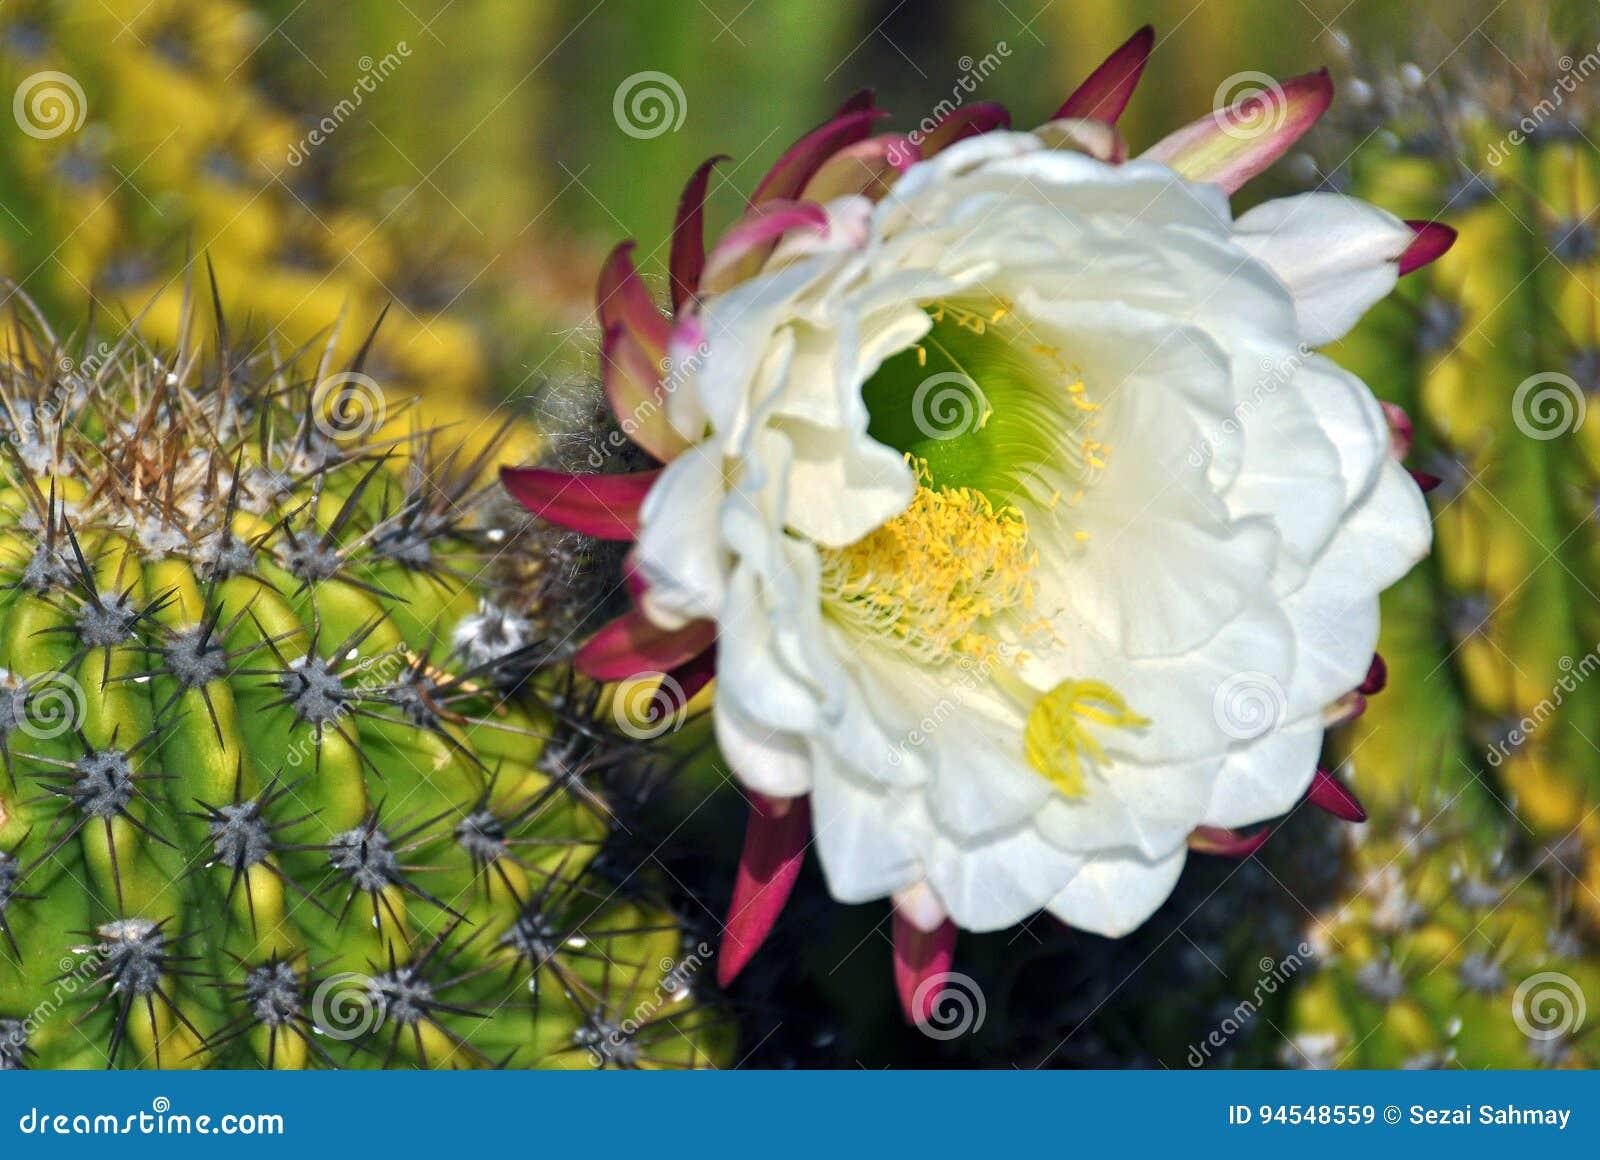 Cactus flower stock image. Image of pereskia, merely - 94548559